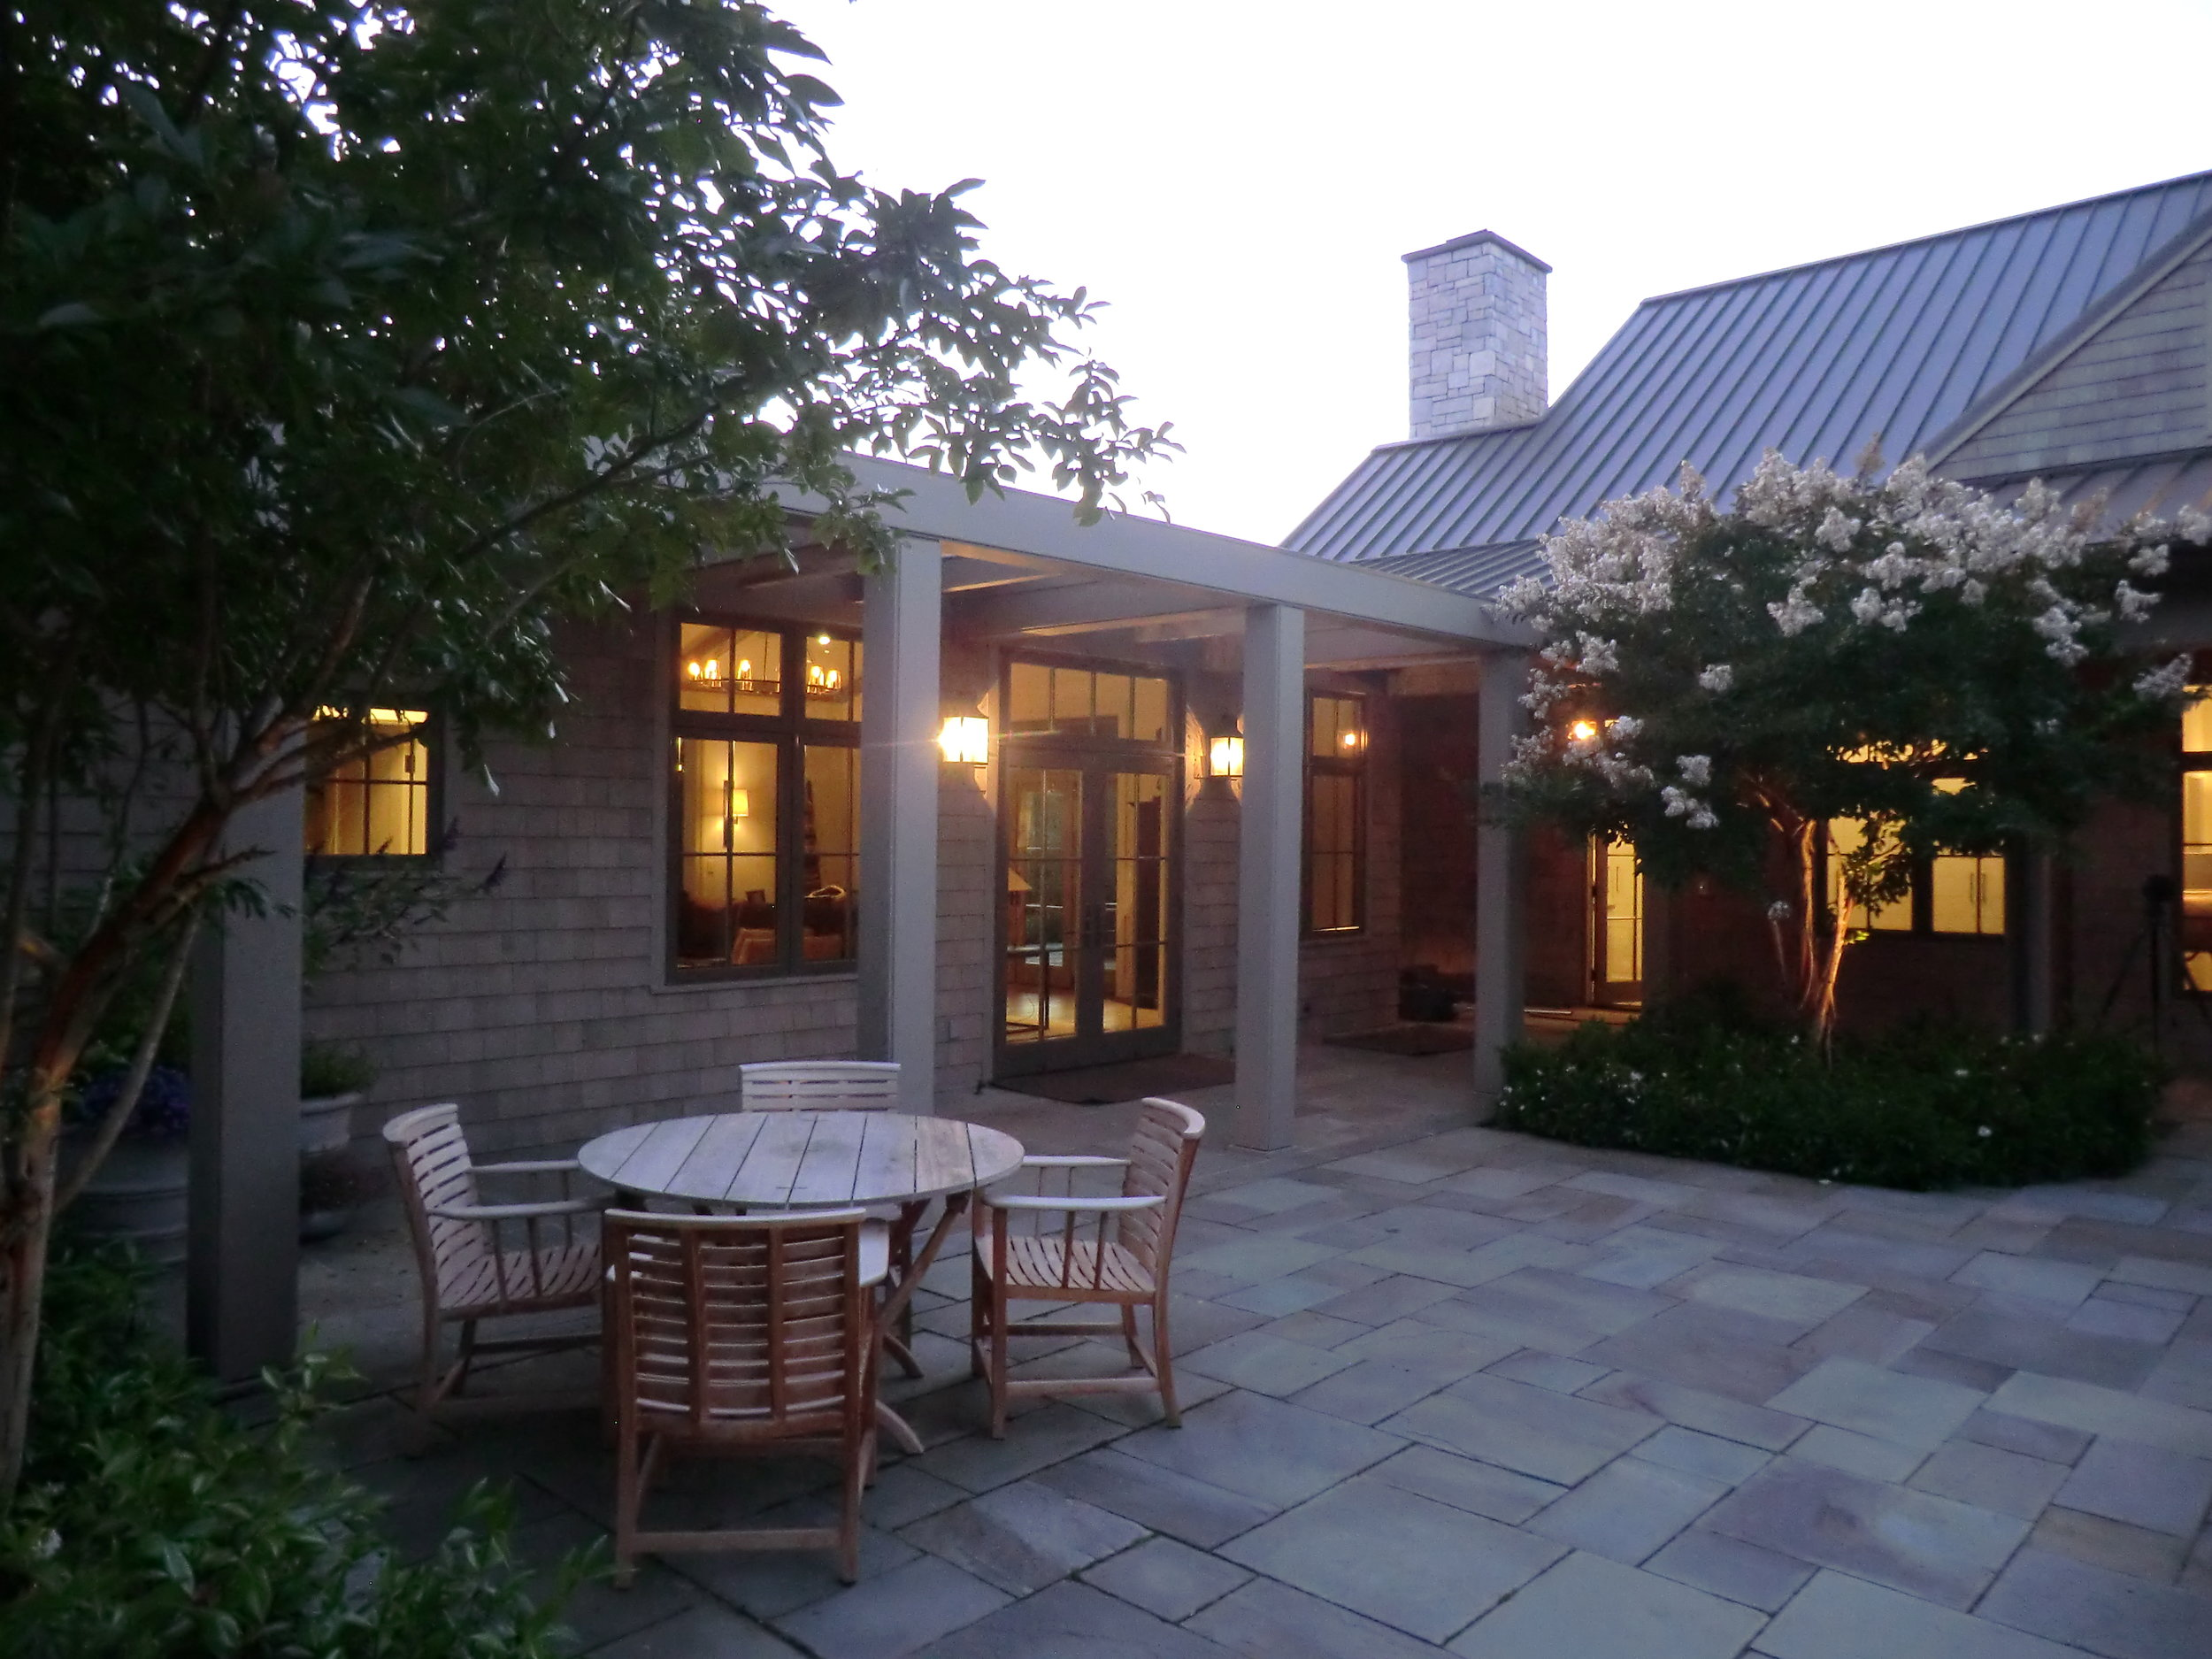 Courtyard dusk 3.JPG